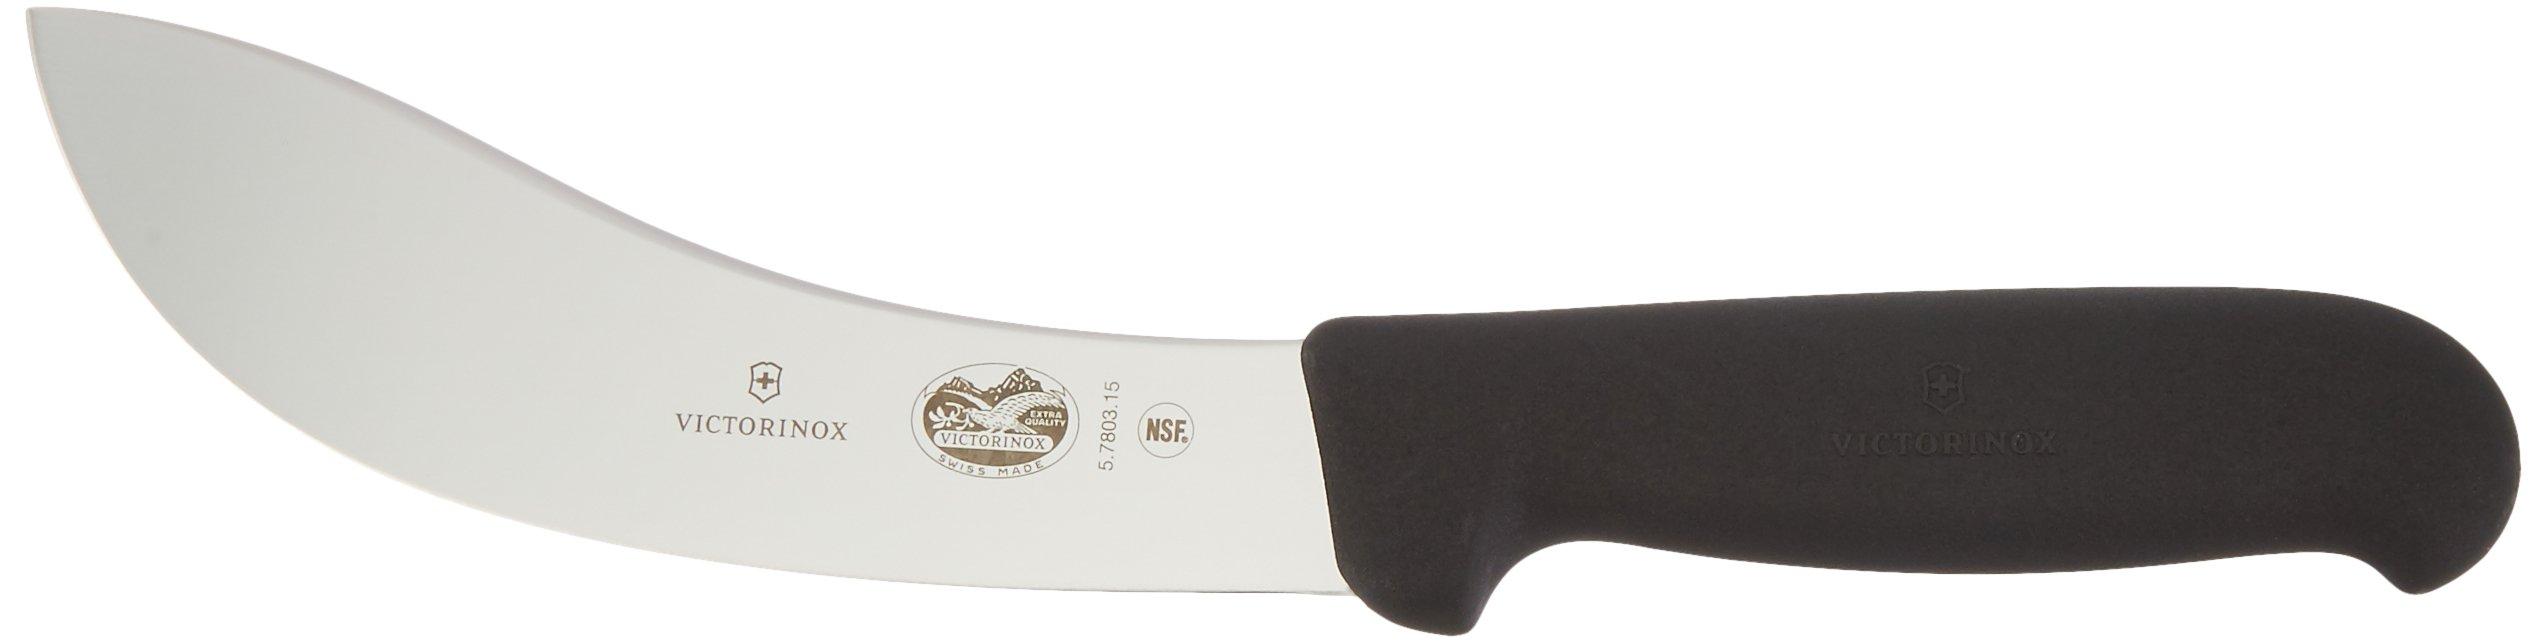 Victorinox Wide Skinning Knife by Victorinox